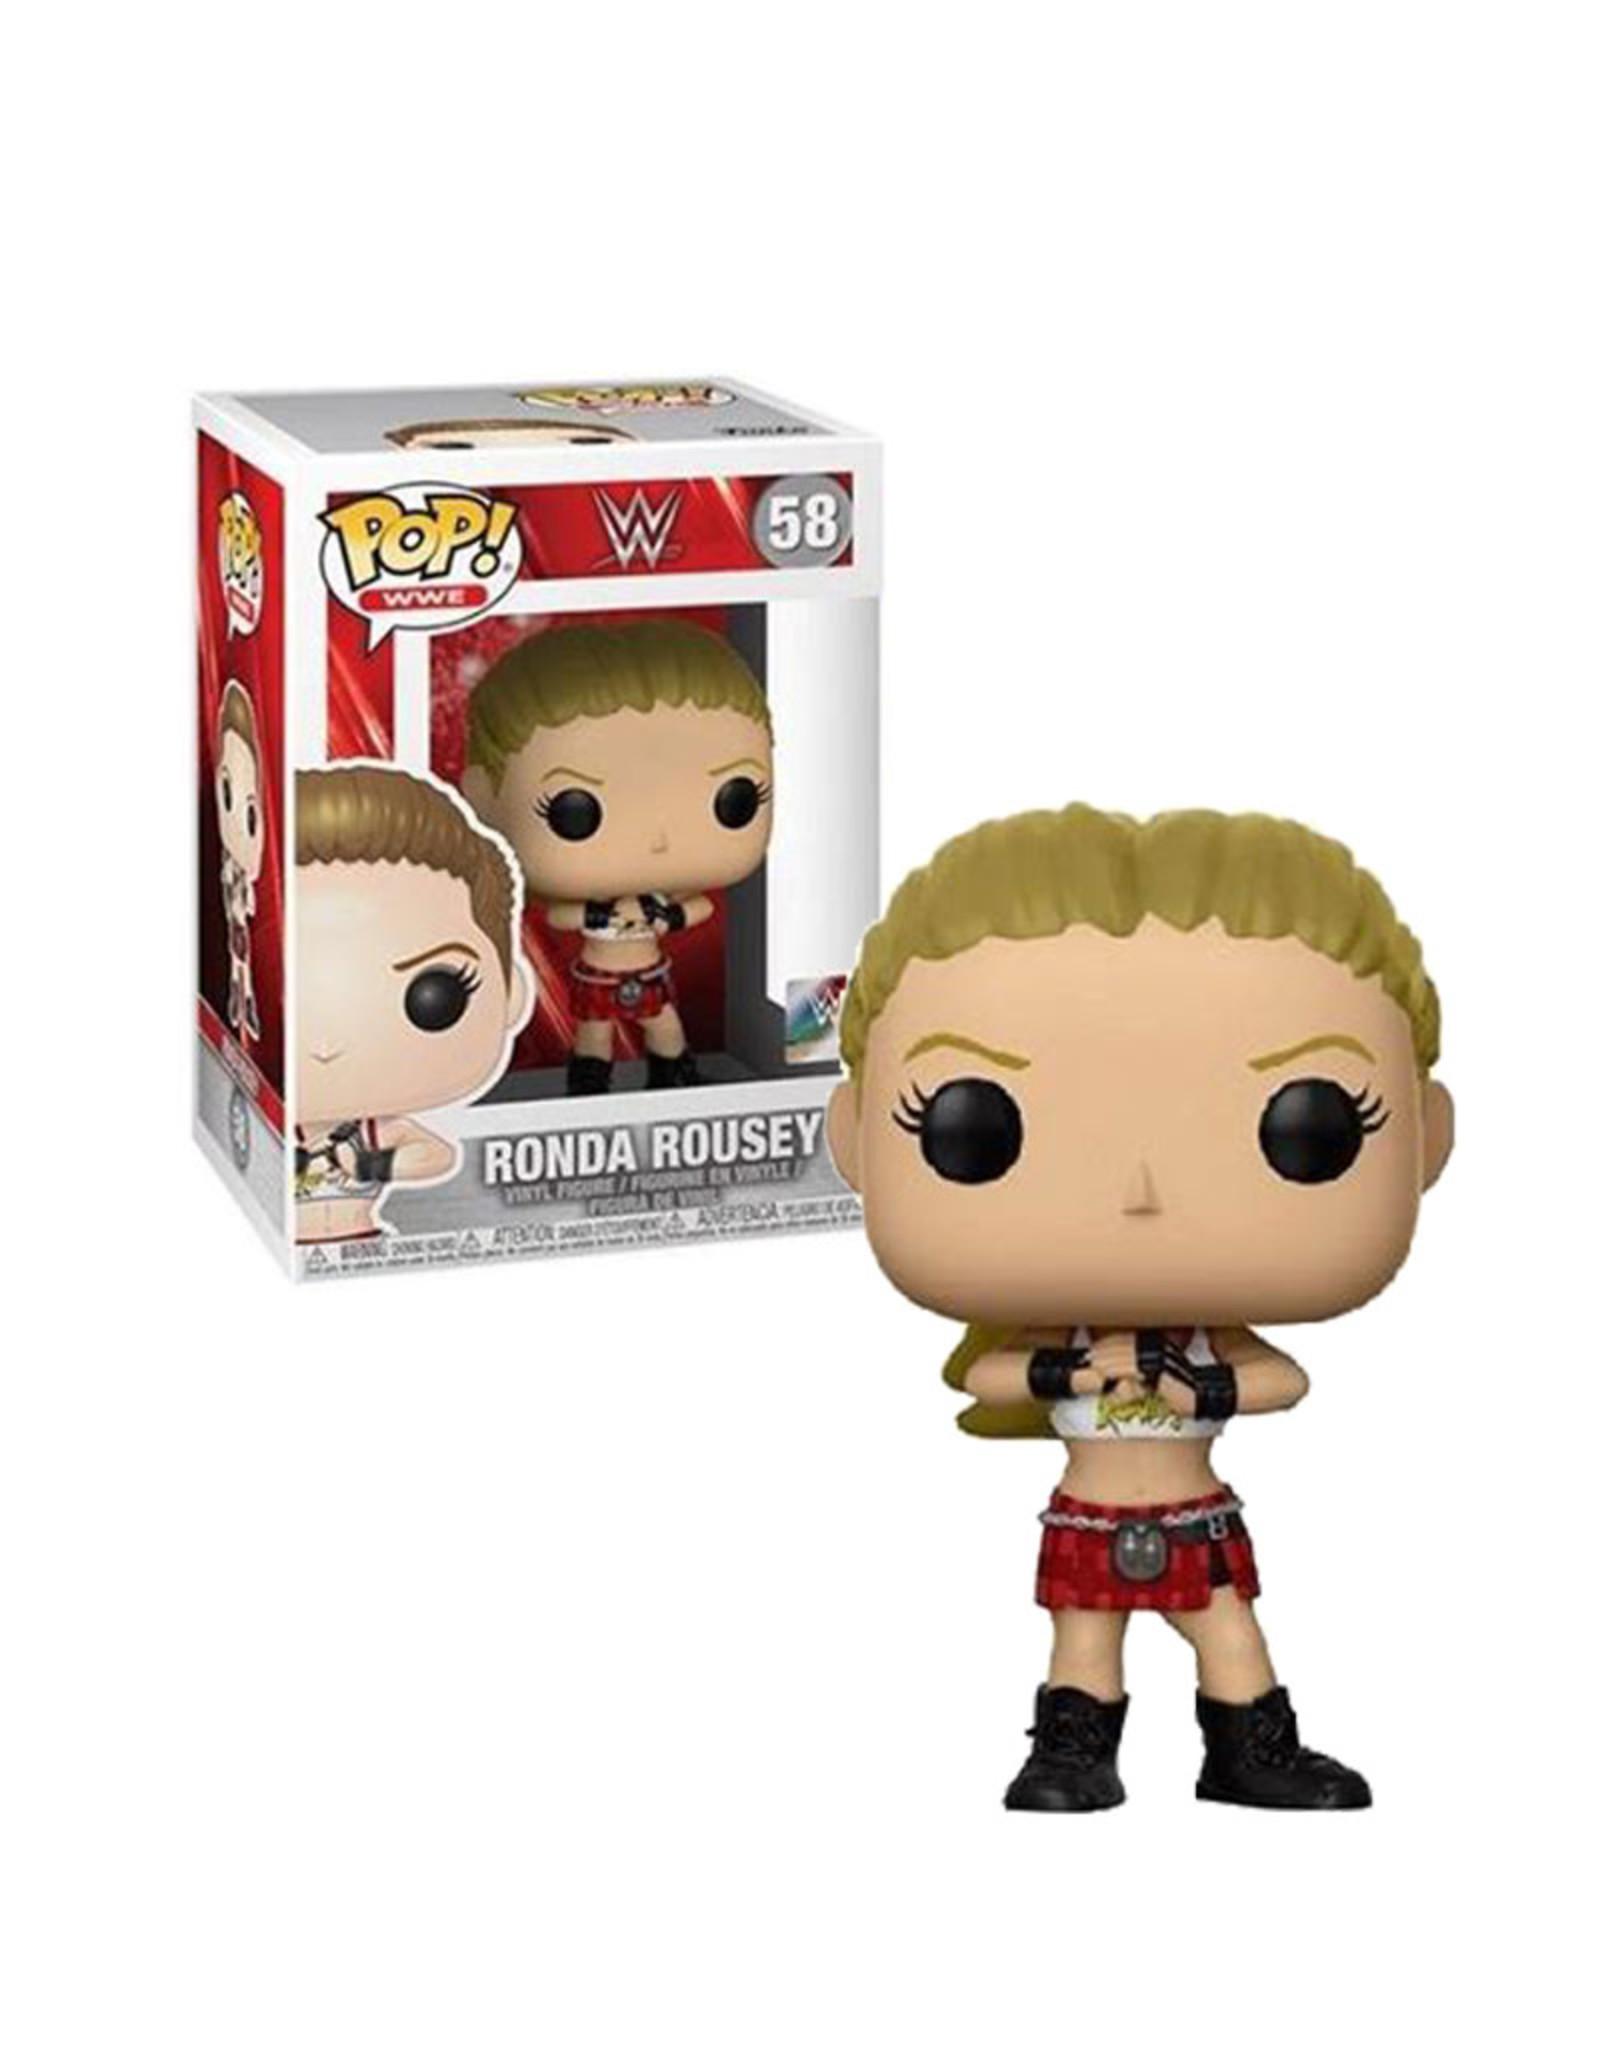 Ronda Rousey 58 ( Funko Pop ) WW